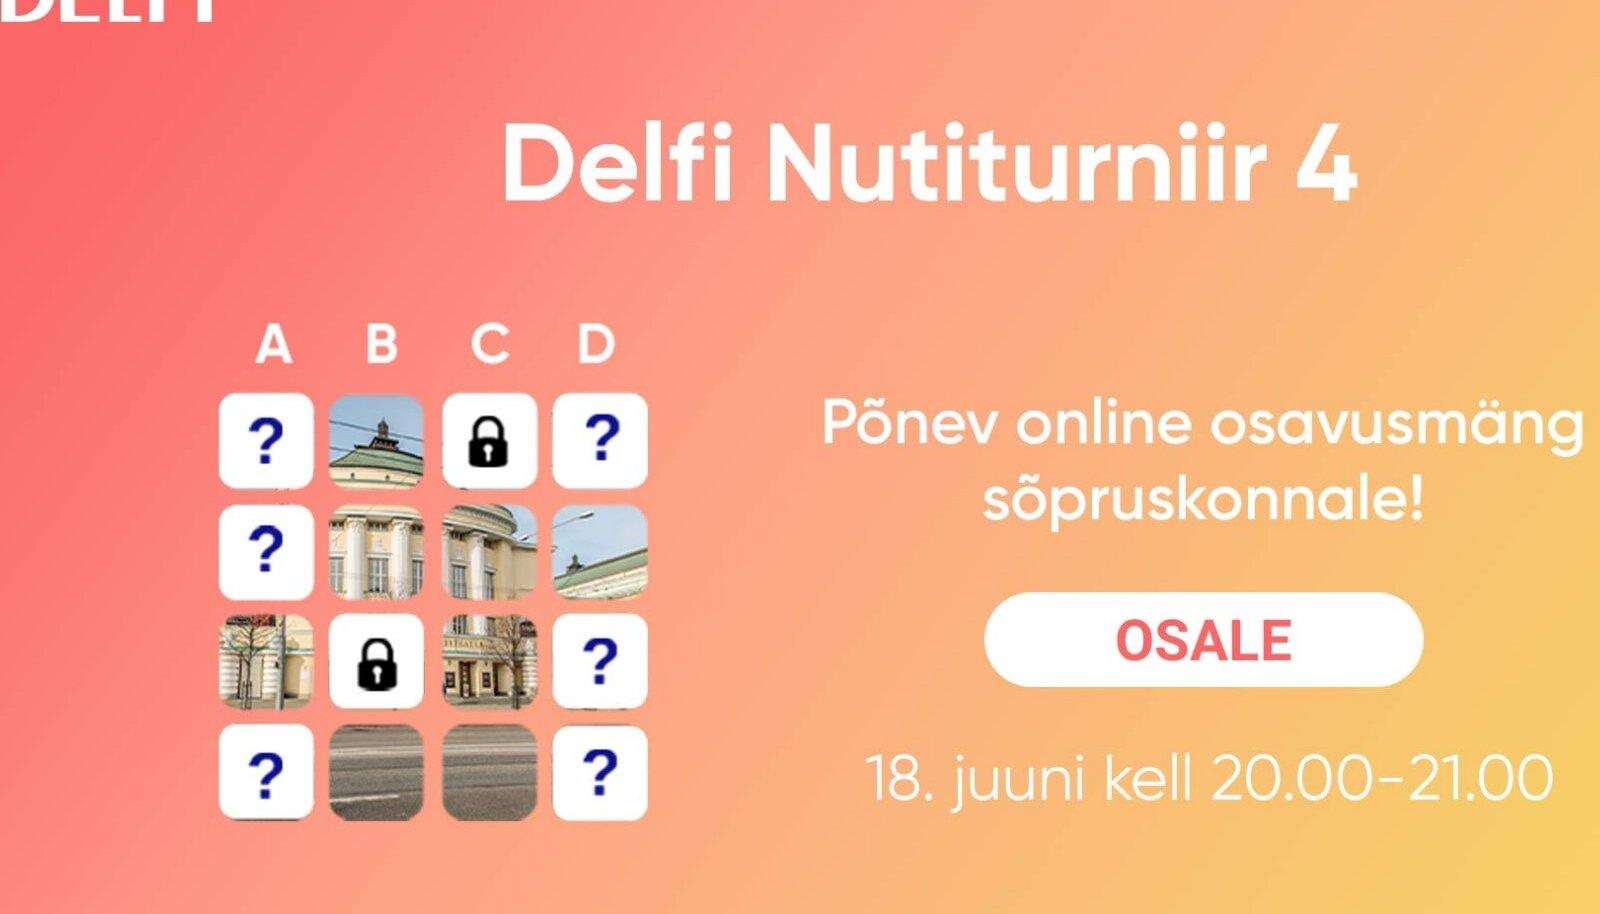 Delfi Nutiturniir 4